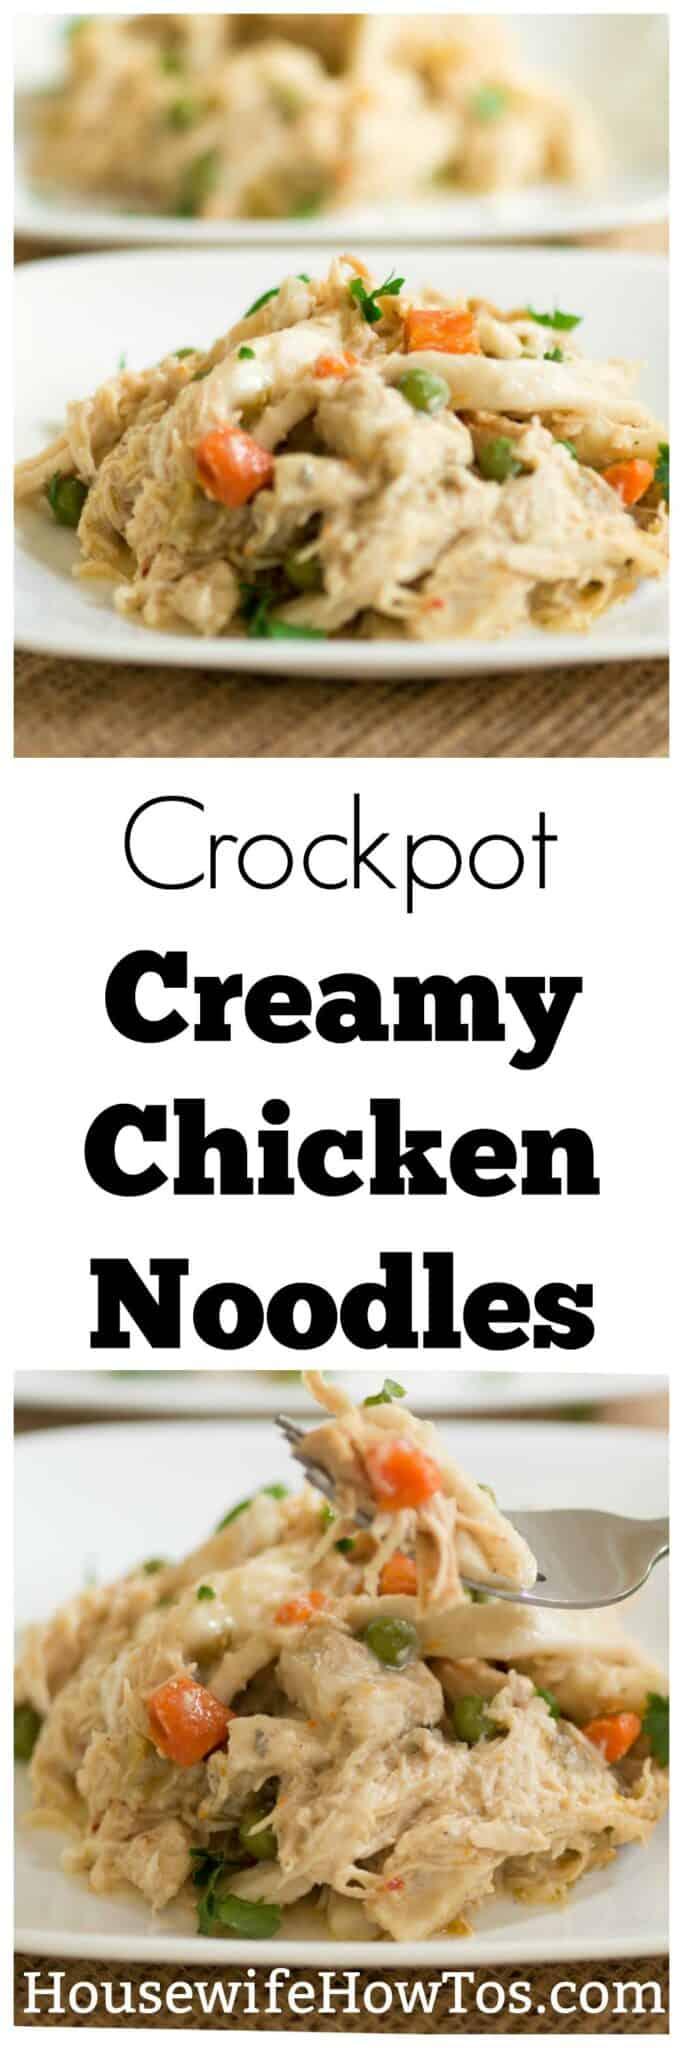 Crockpot Creamy Chicken Noodles Recipe | Seasoned chicken, vibrant vegetables, and tender noodles in an easy, creamy sauce. | #crockpotrecipe #comfortfood #chickennoodles #chicken #noodles #slowcooker #easydinnerrecipe